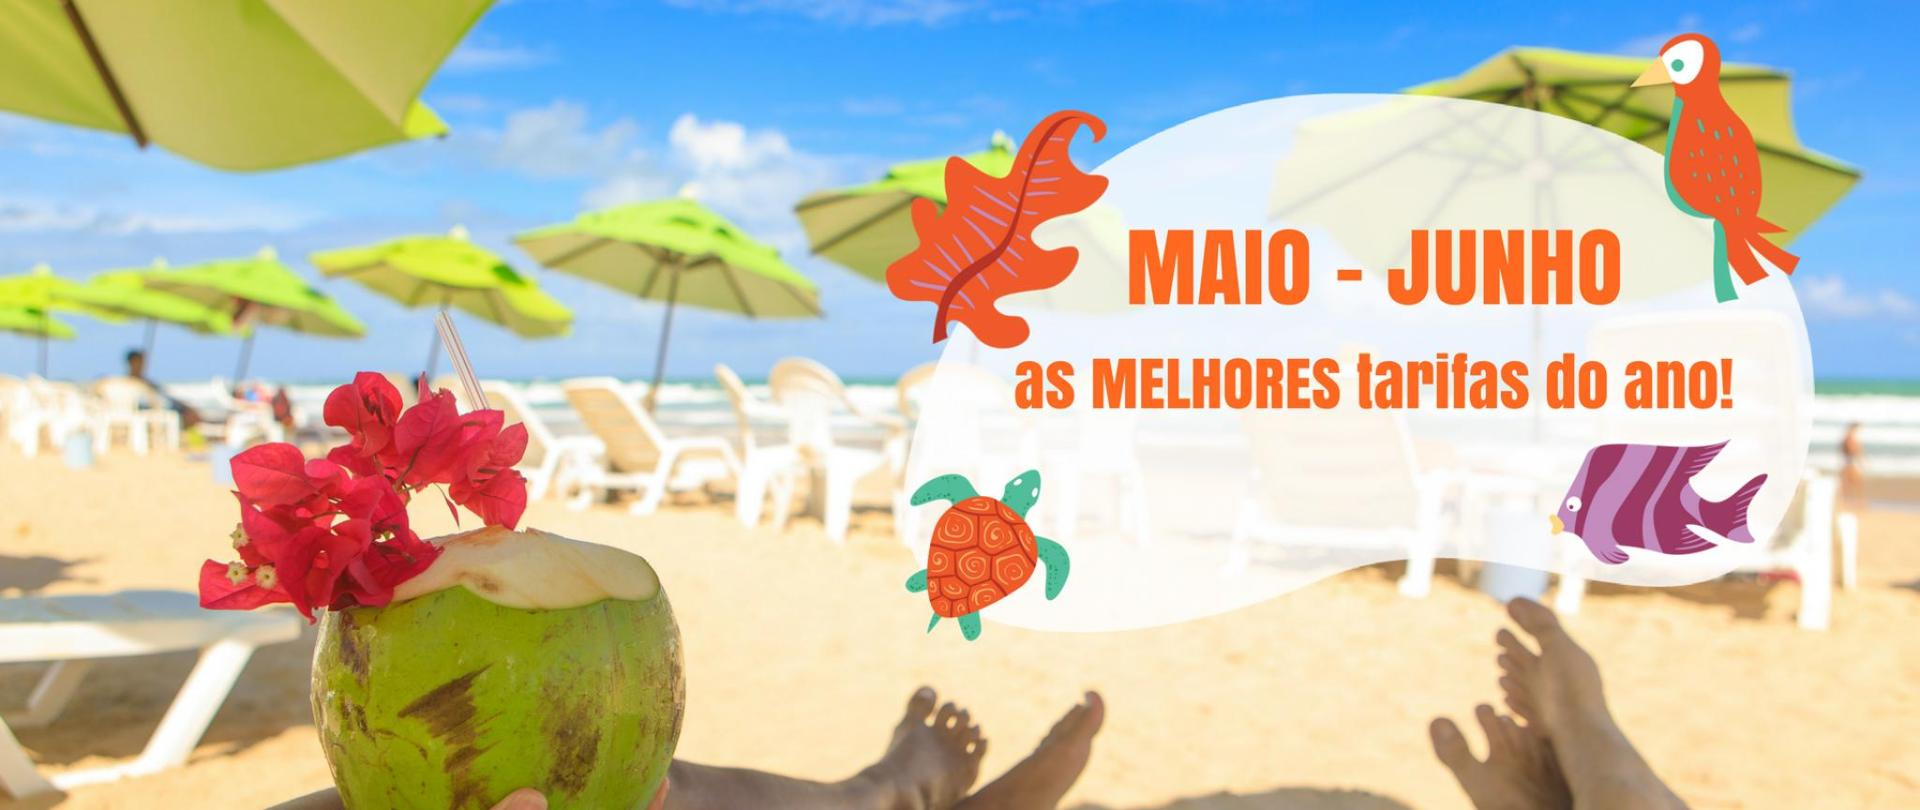 MAIO - JUNHO SOLAR (3).png